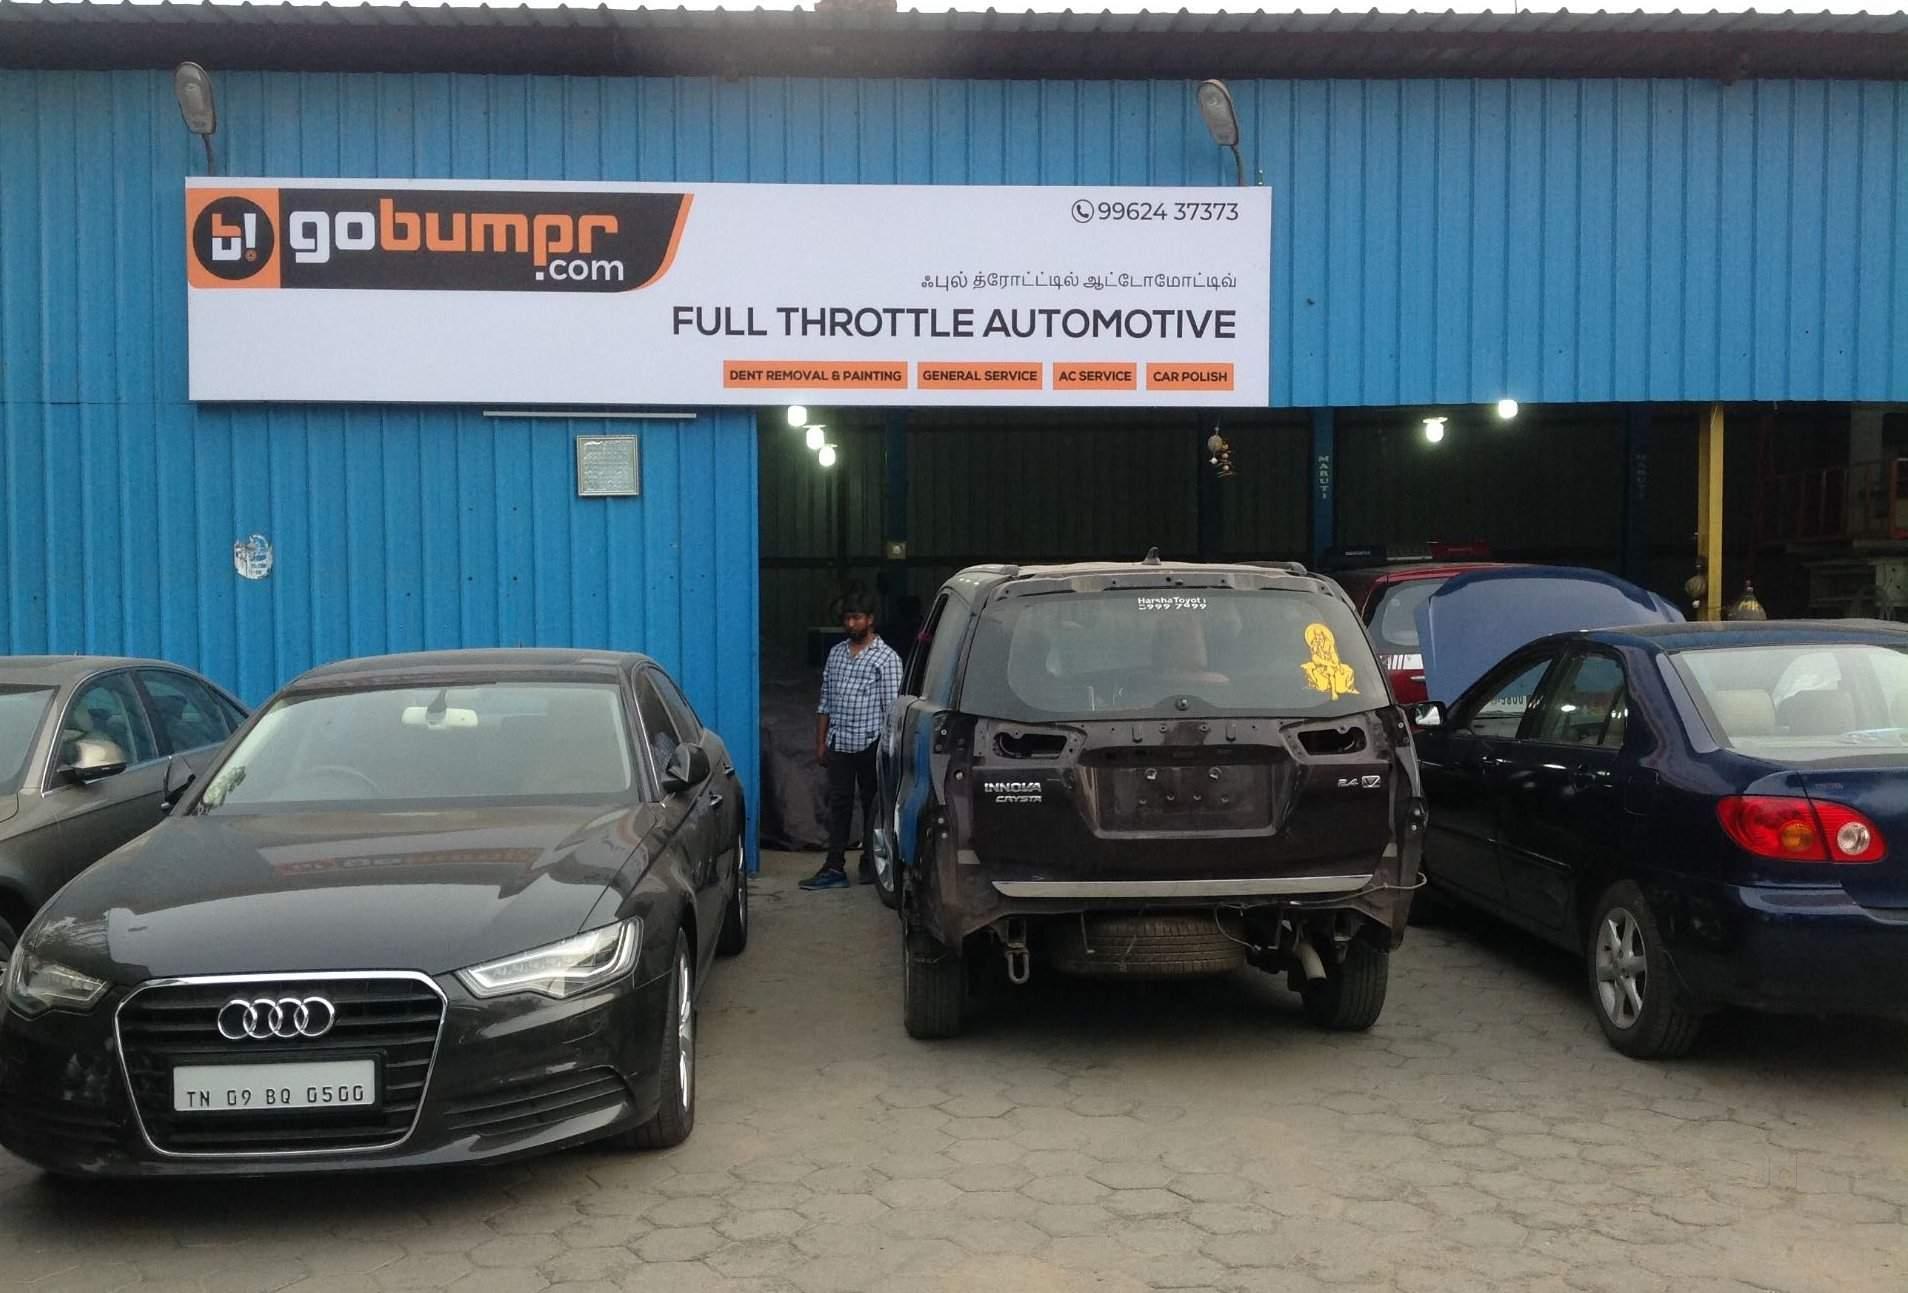 Full Throttle Automotive Ekkaduthangal Car Repair Services In Chennai Justdial